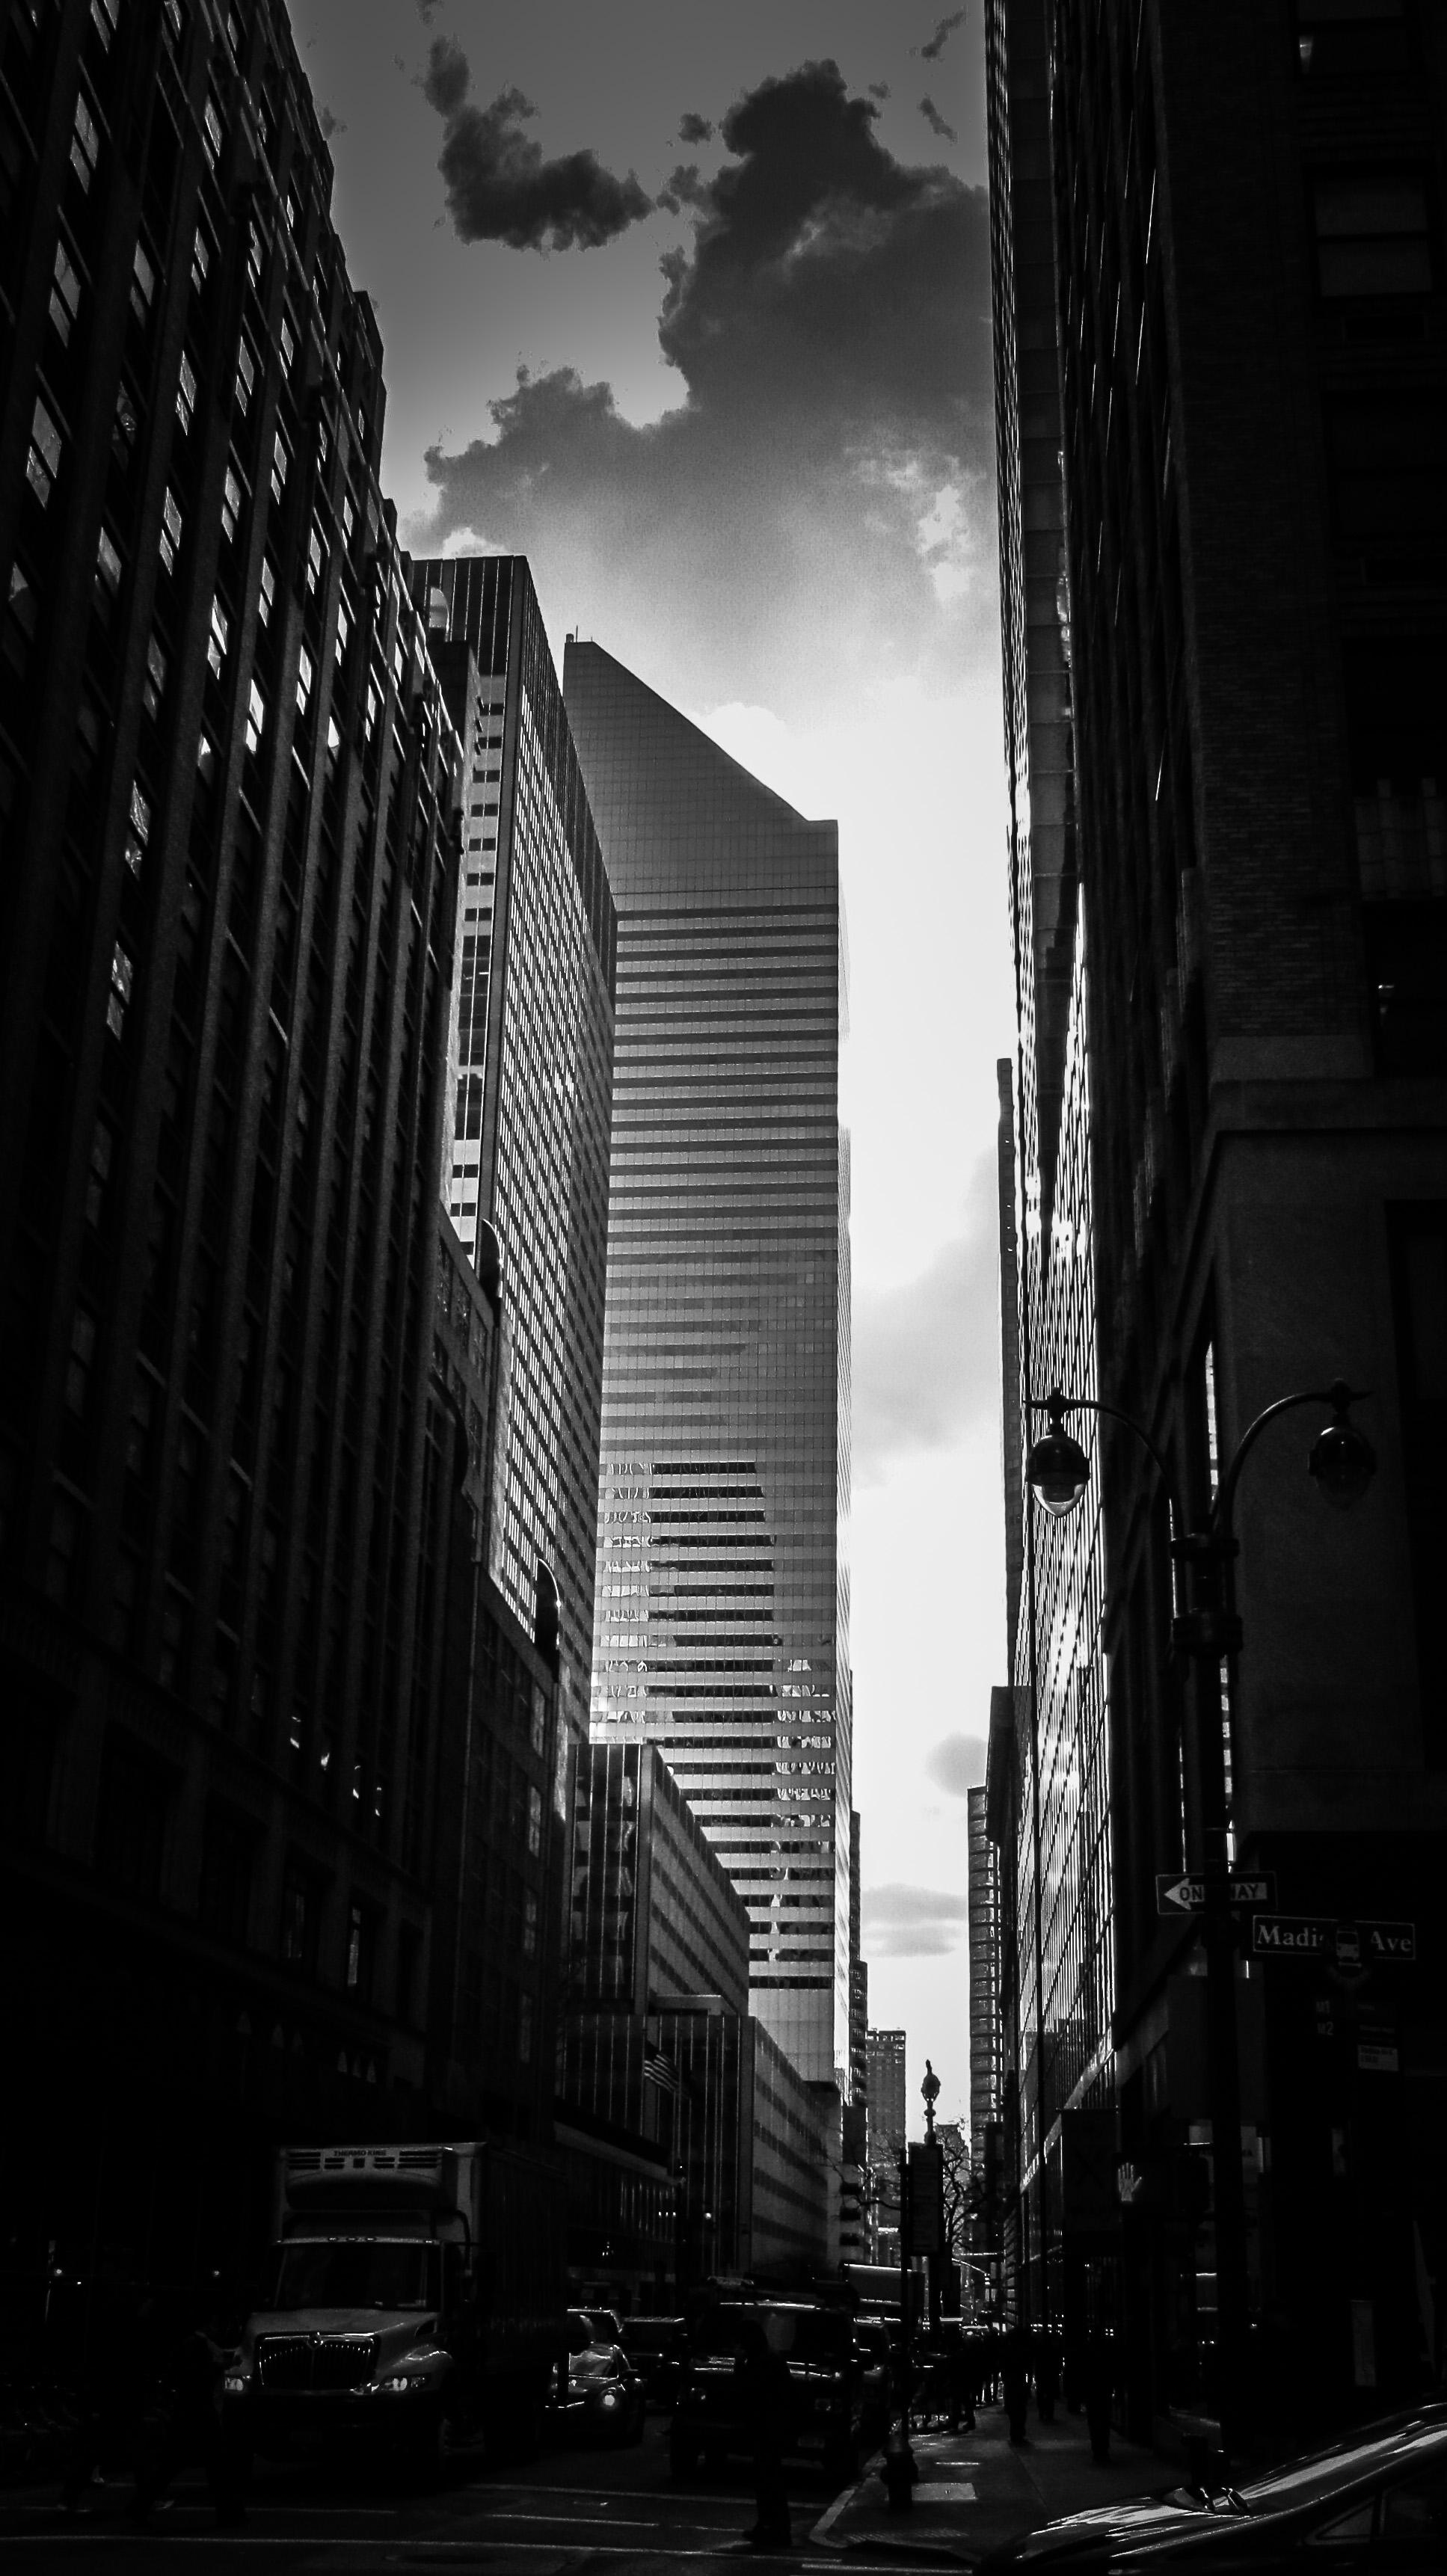 Citigroup_7400_B&W